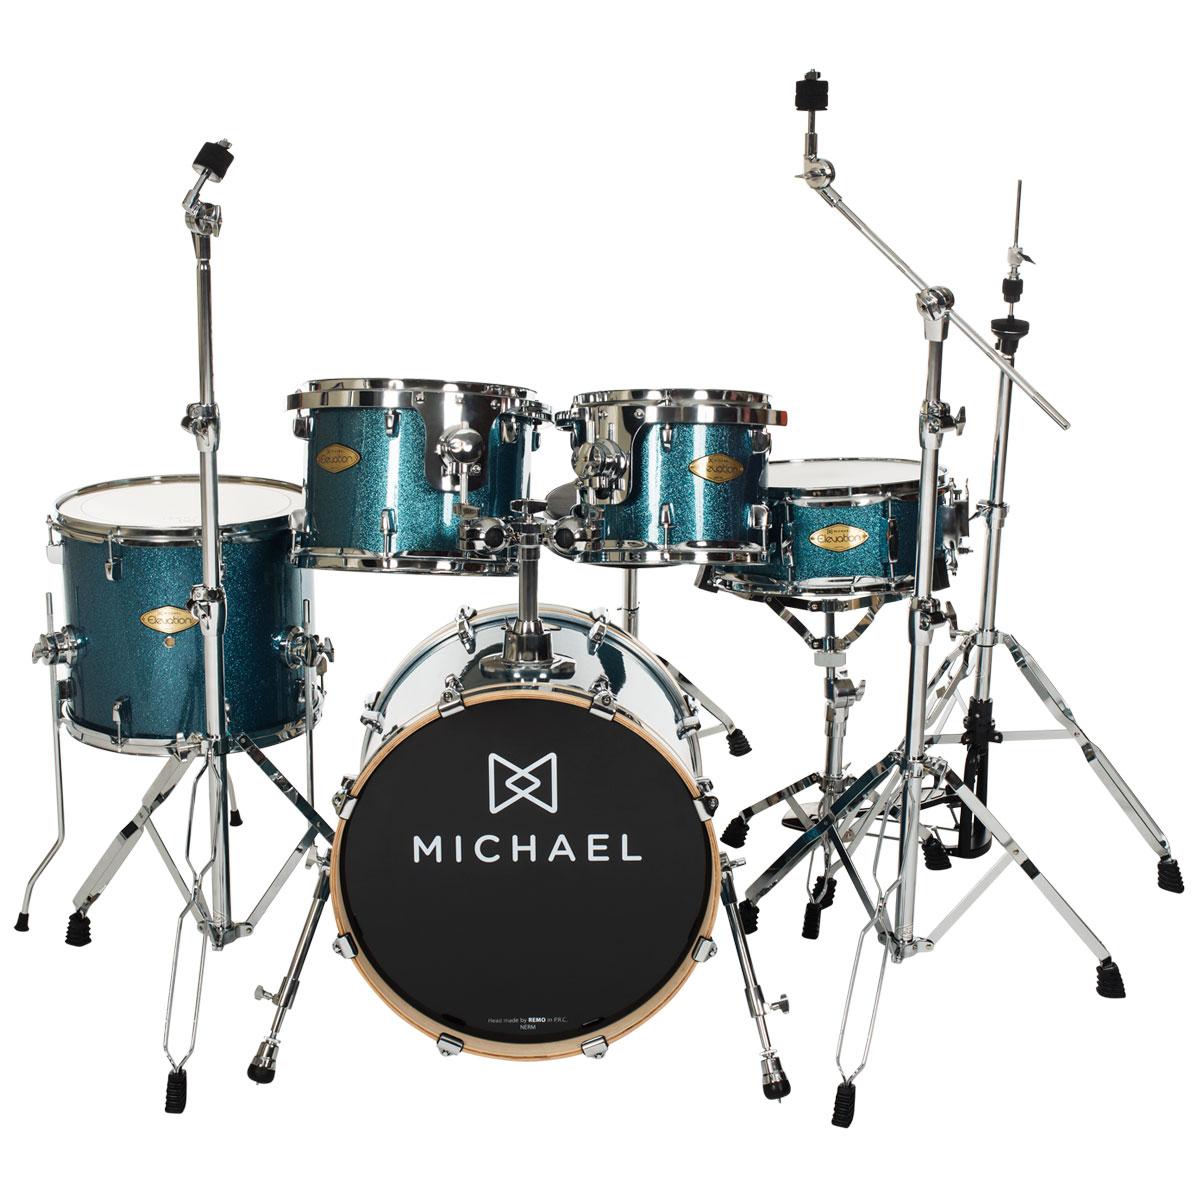 Bateria Acústica Bumbo 20 Polegadas Elevation DM852 BLS Azul Sparkle - Michael